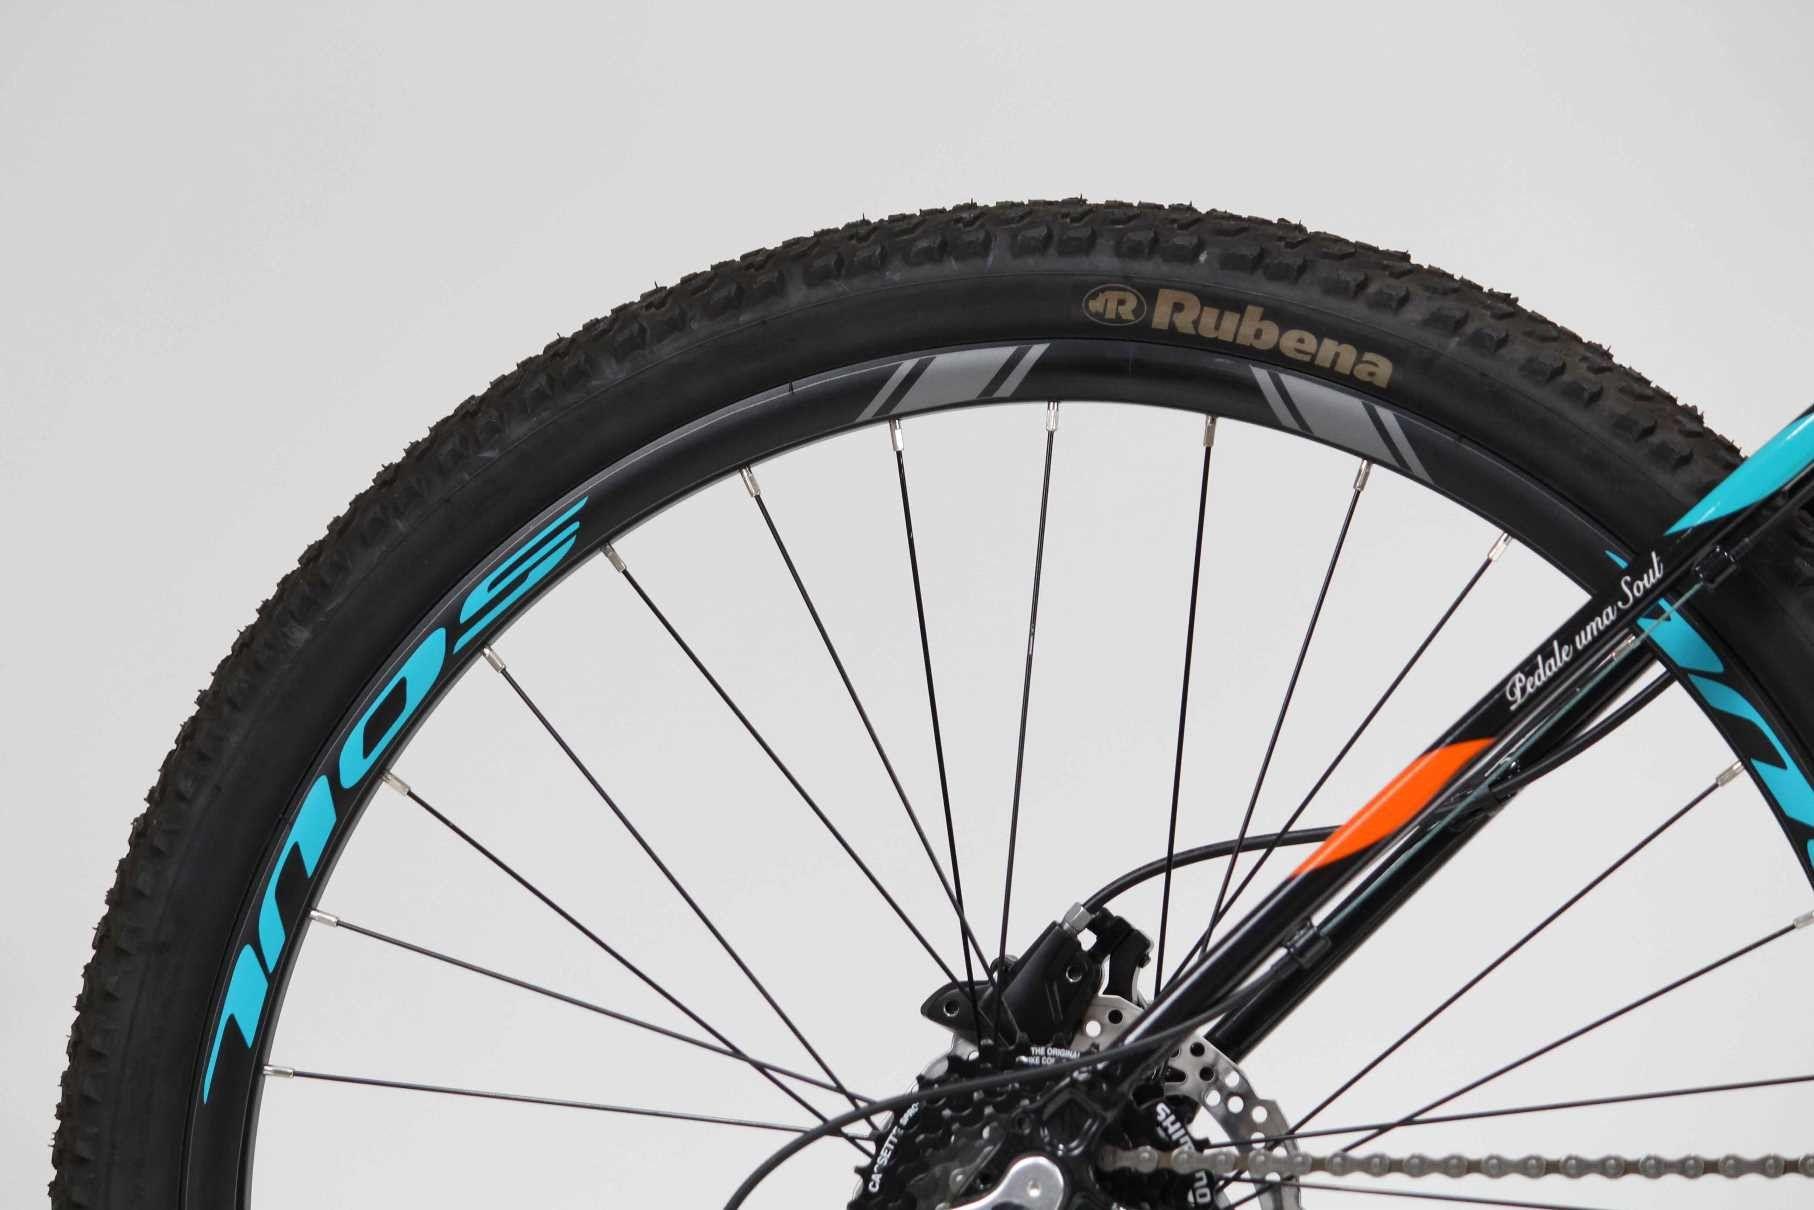 Bicicleta Aro 27.5 Soul Roots 24V Hidrául. Pto/vde